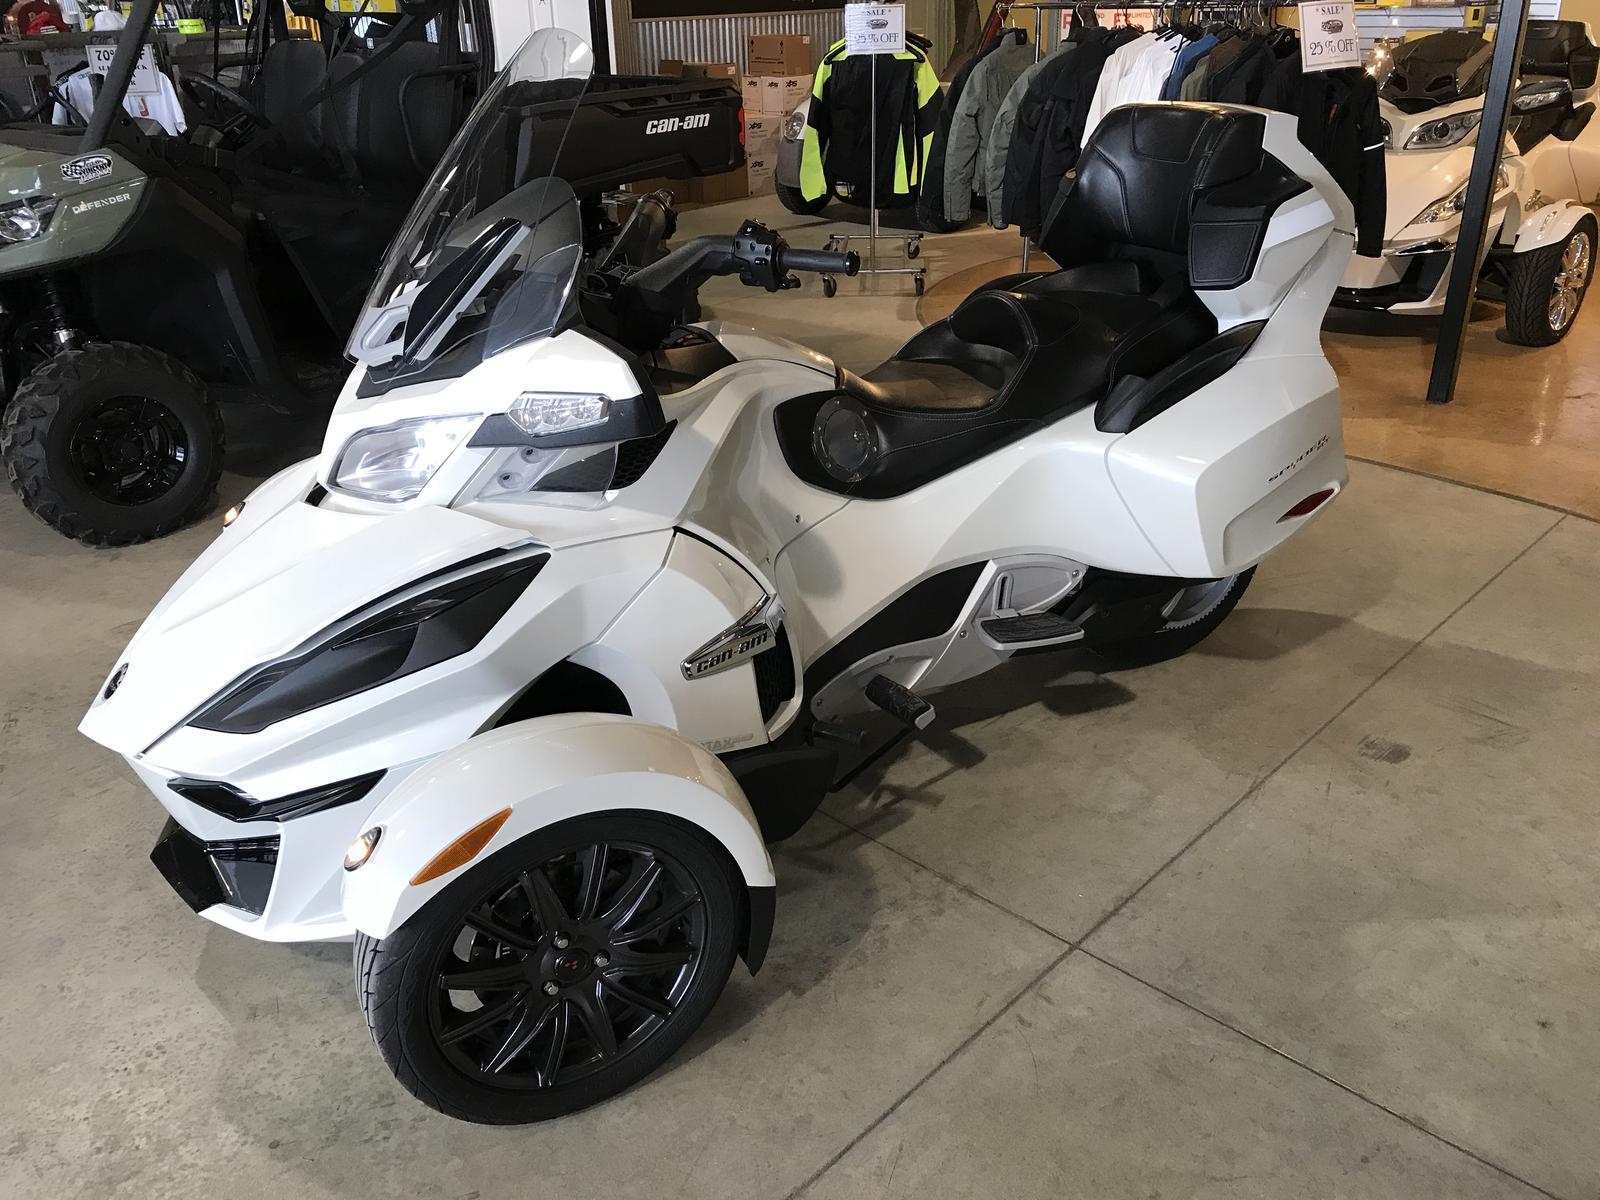 2014 Can-Am ATV SPYDER RT SE6 | 1 of 4